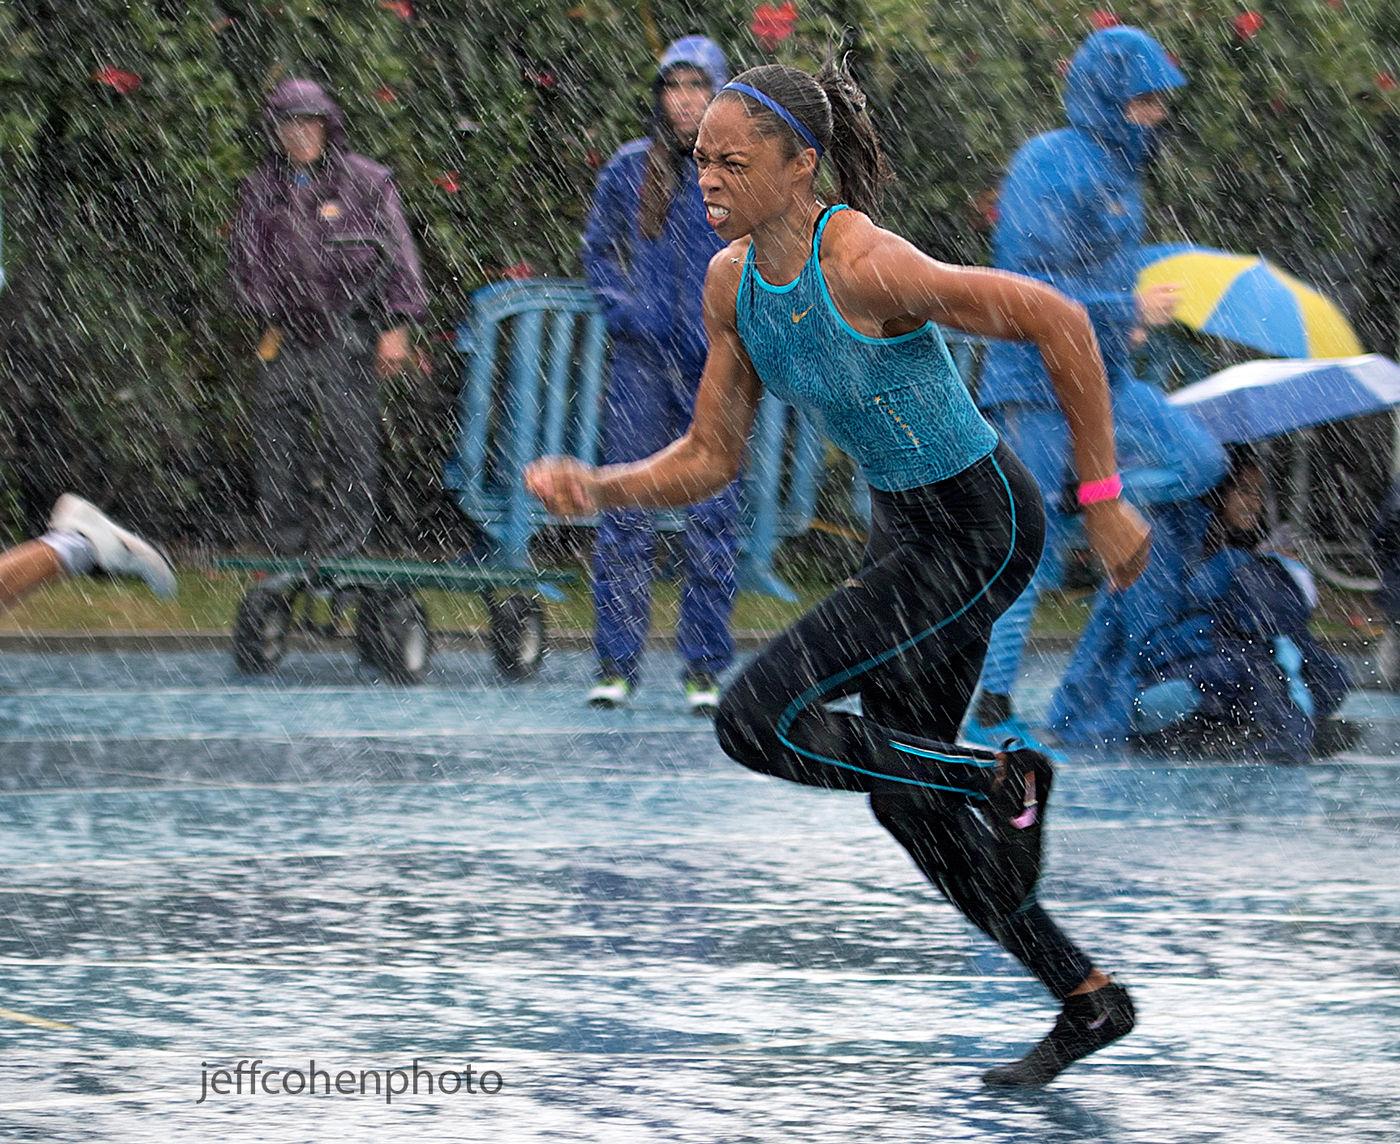 1jjk_rafer_4_9_16_af_4x100_rain__jeff_cohen_photo_59_web.jpg